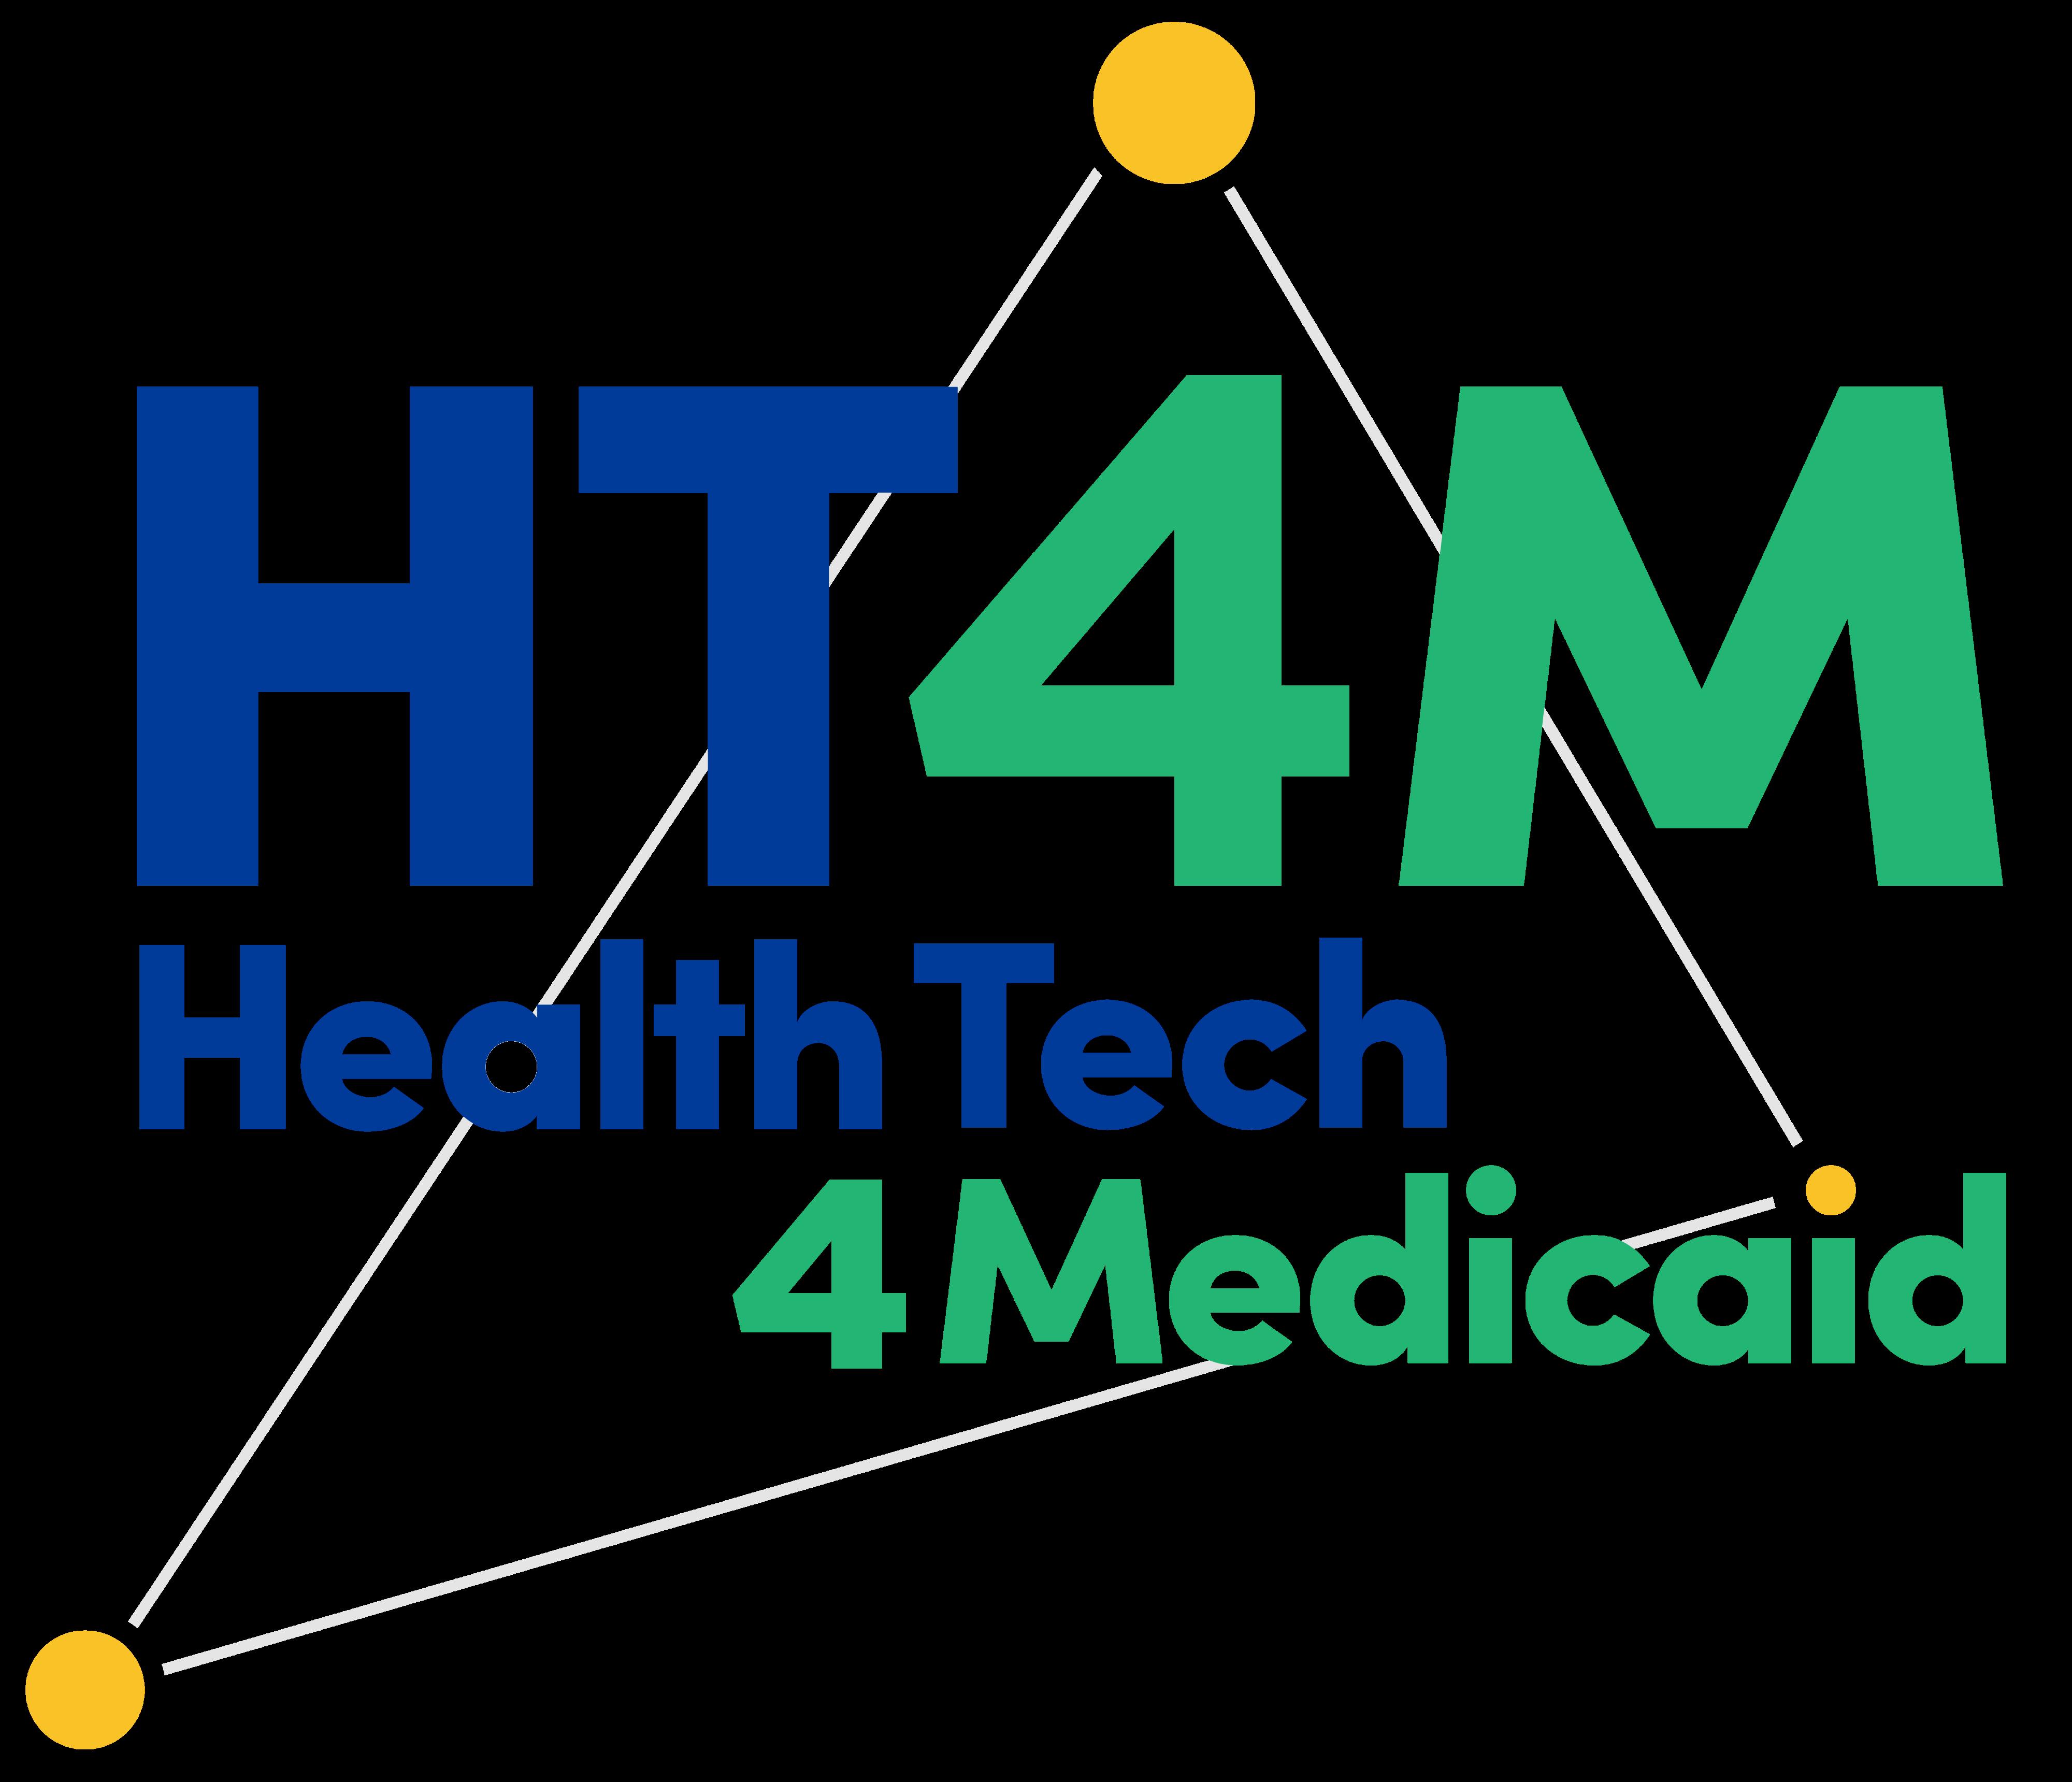 HT4M - HealthTech 4 Medicaid